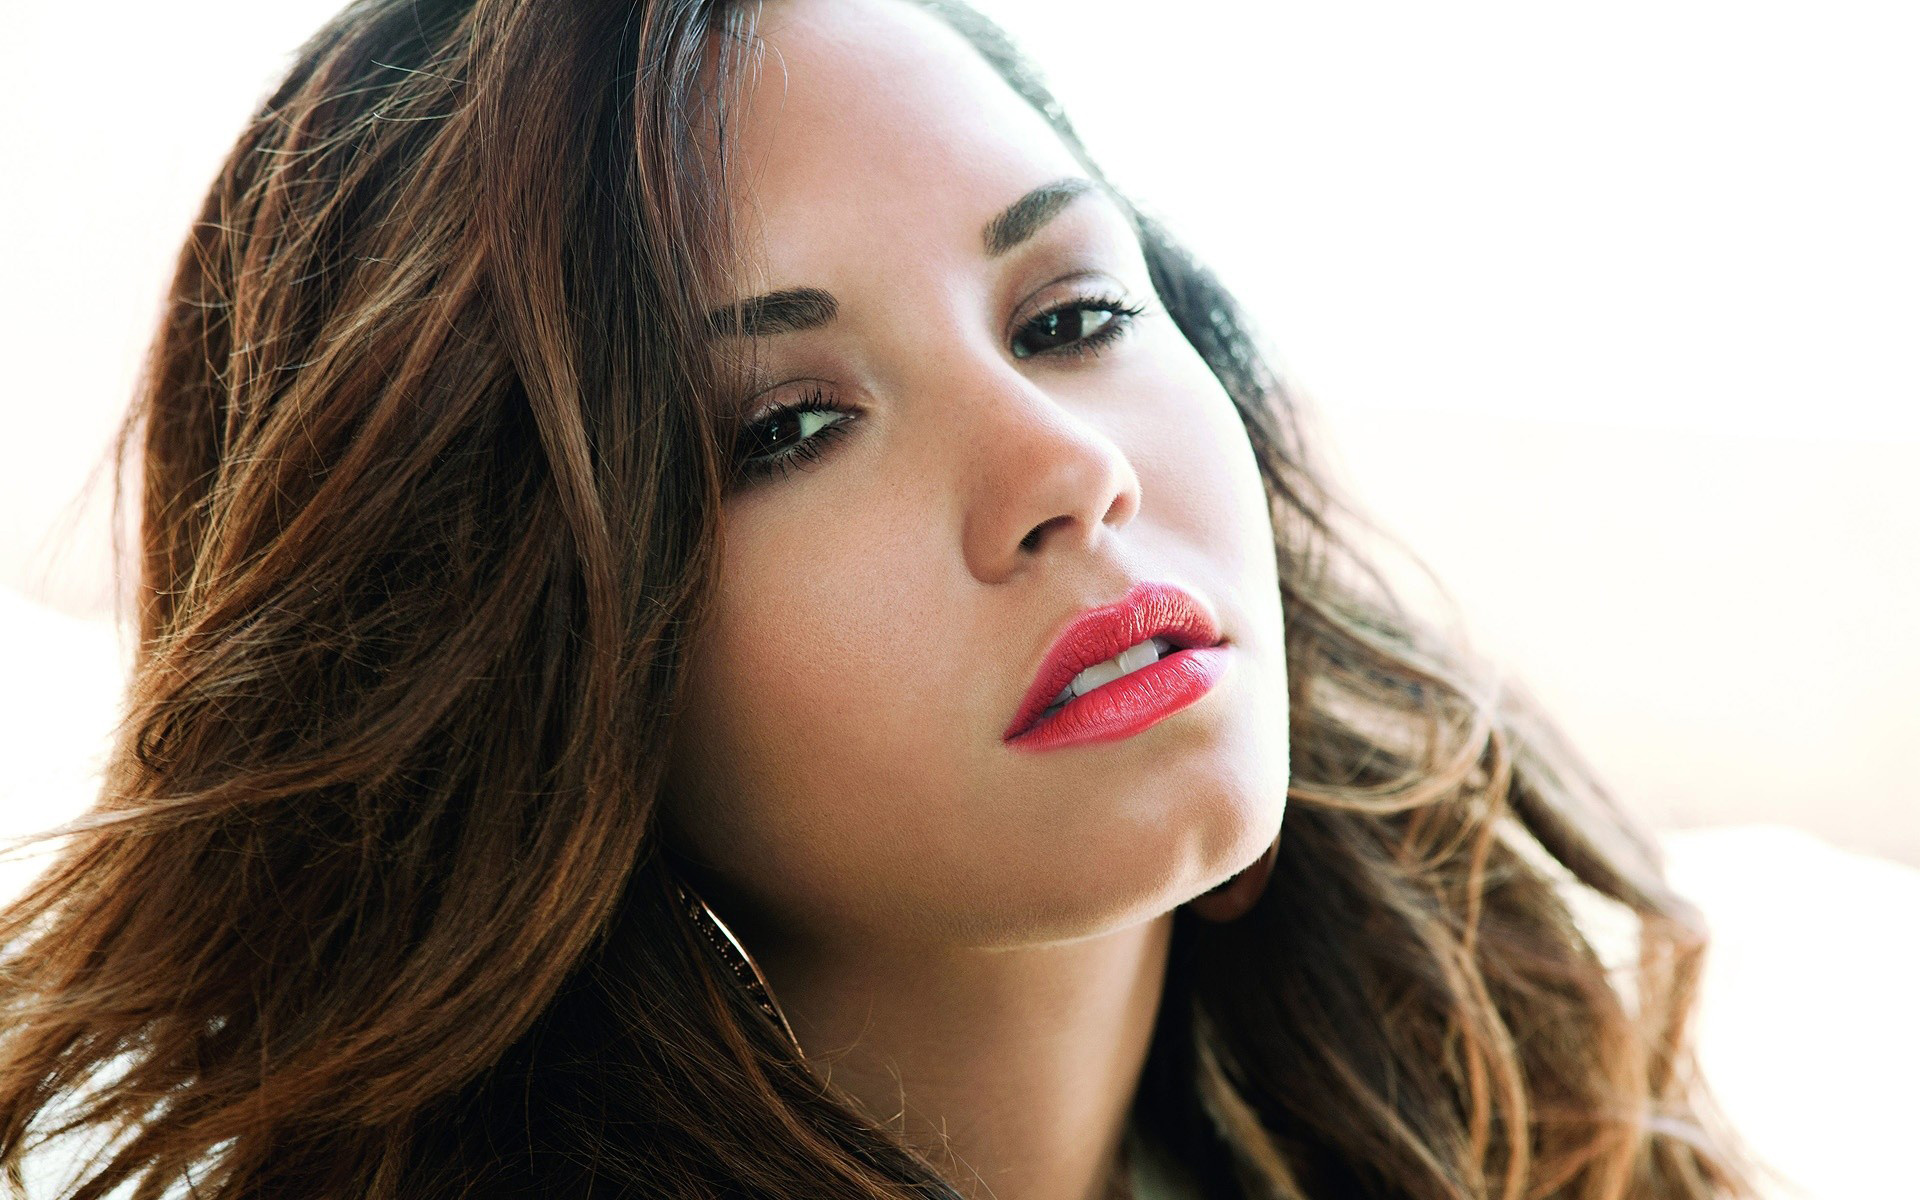 Demi Lovato 2015 Wallpapers HD Wallpapers 1920x1200